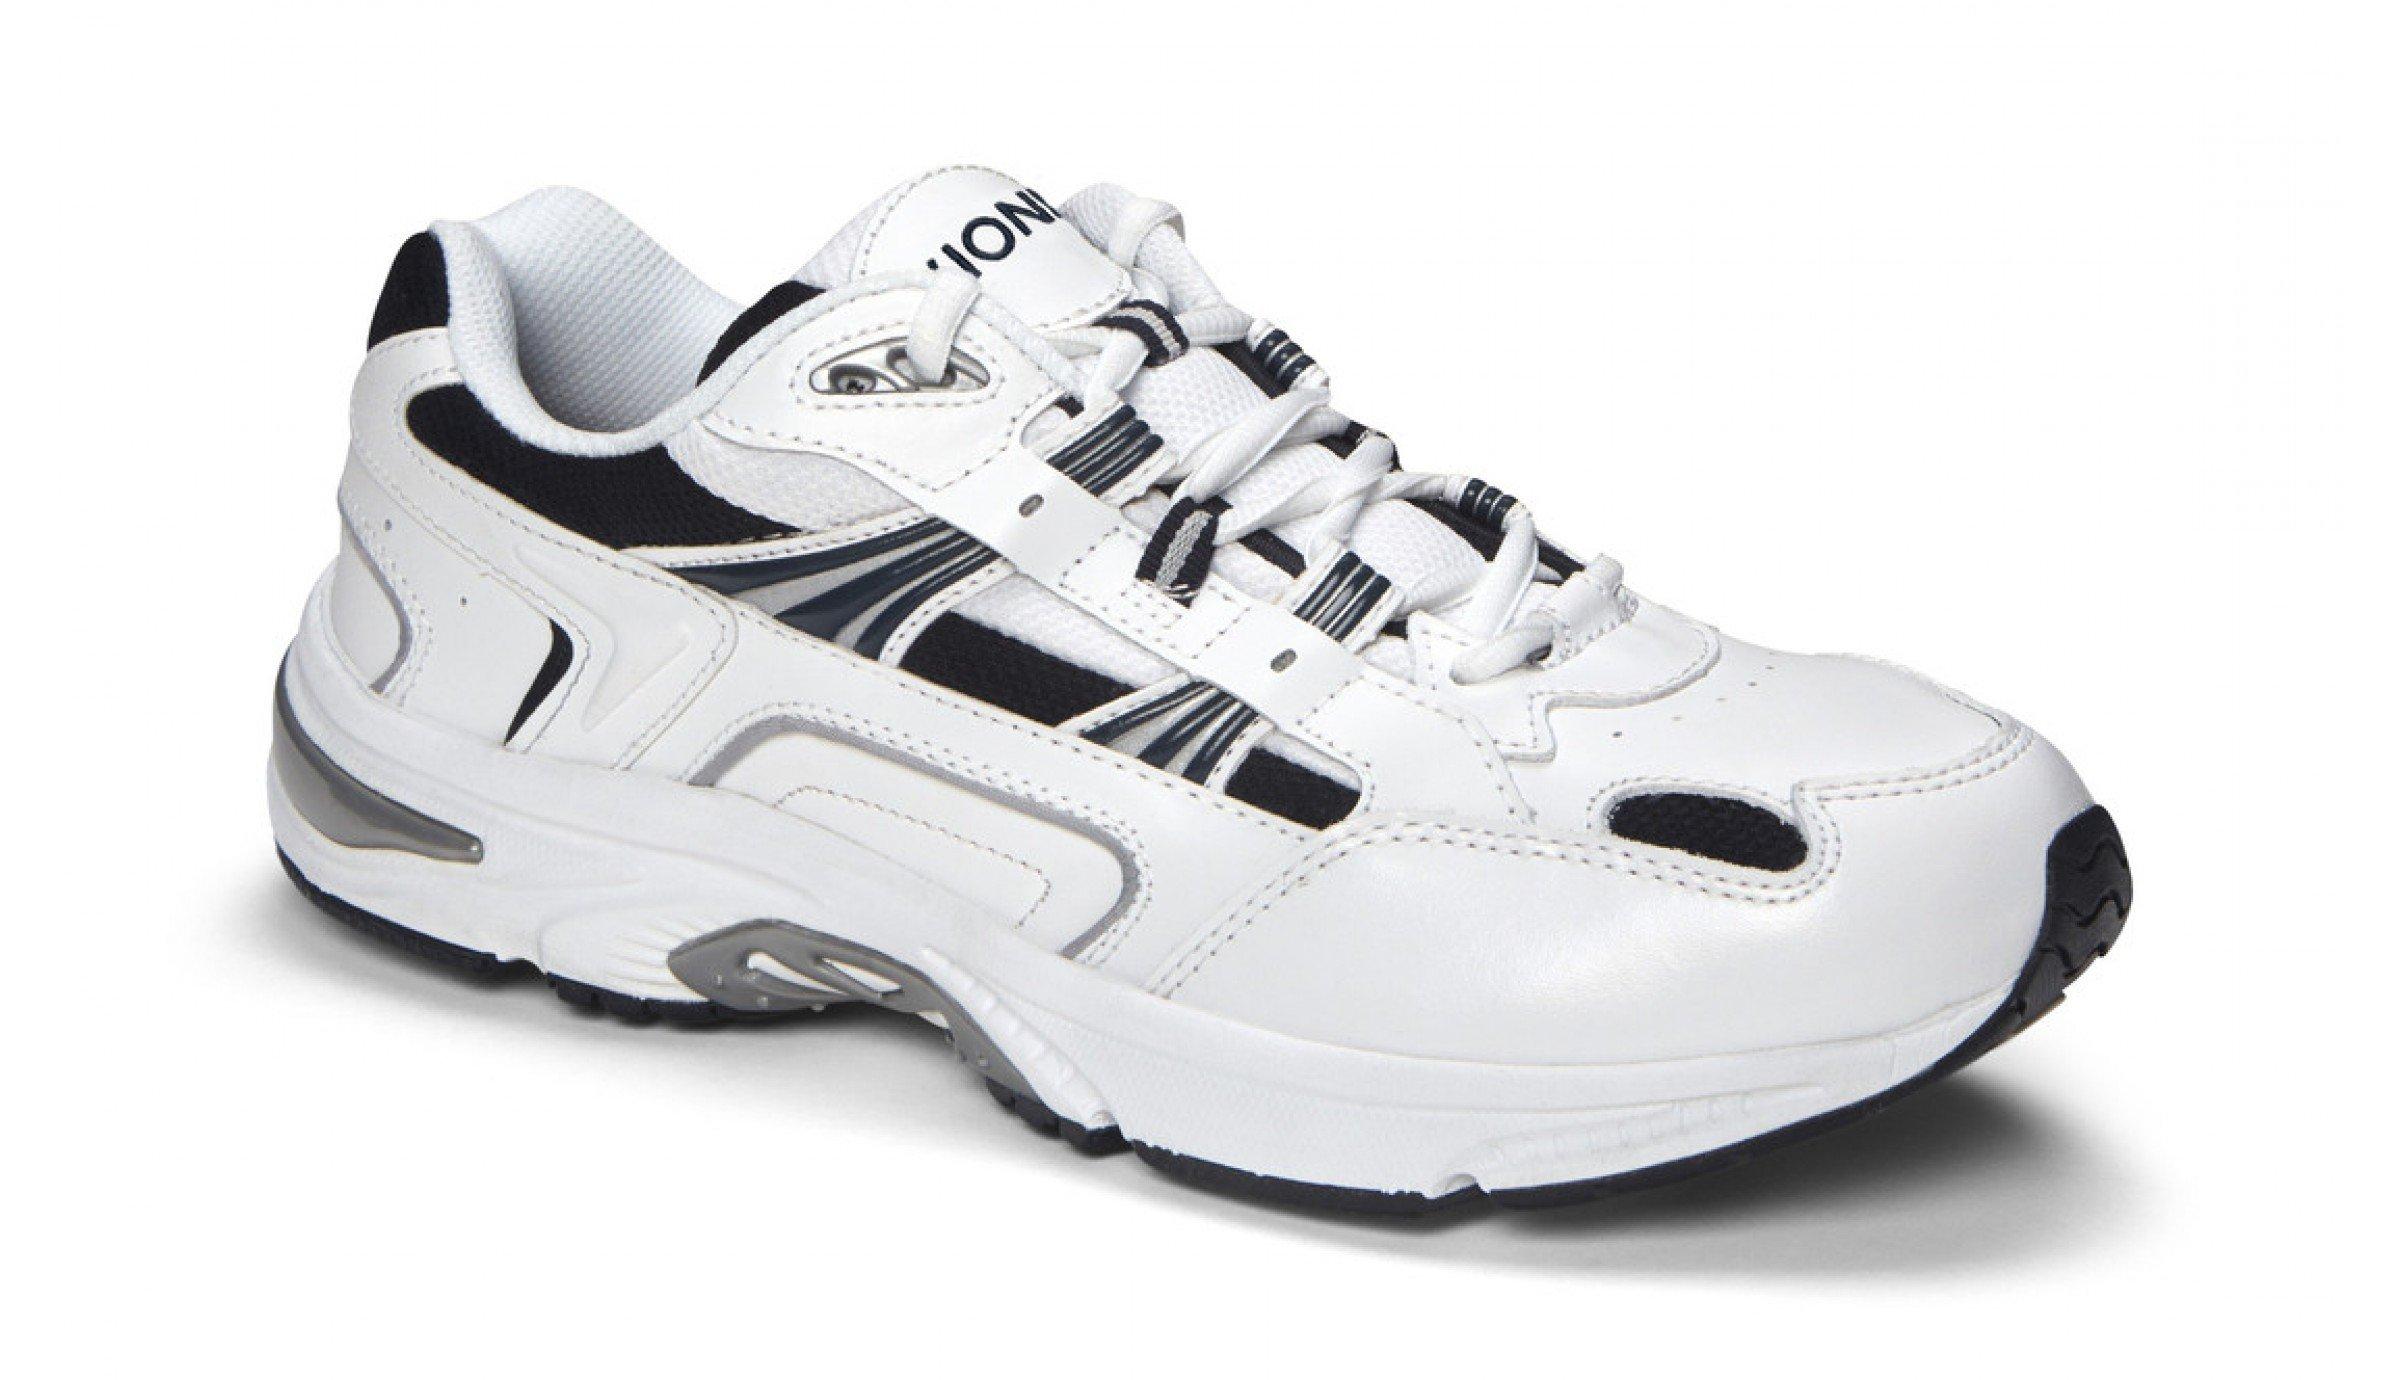 Vionic Men's Men's Walker Shoe White Navy 9 / W & Travel Sunscreen Spray Bundle